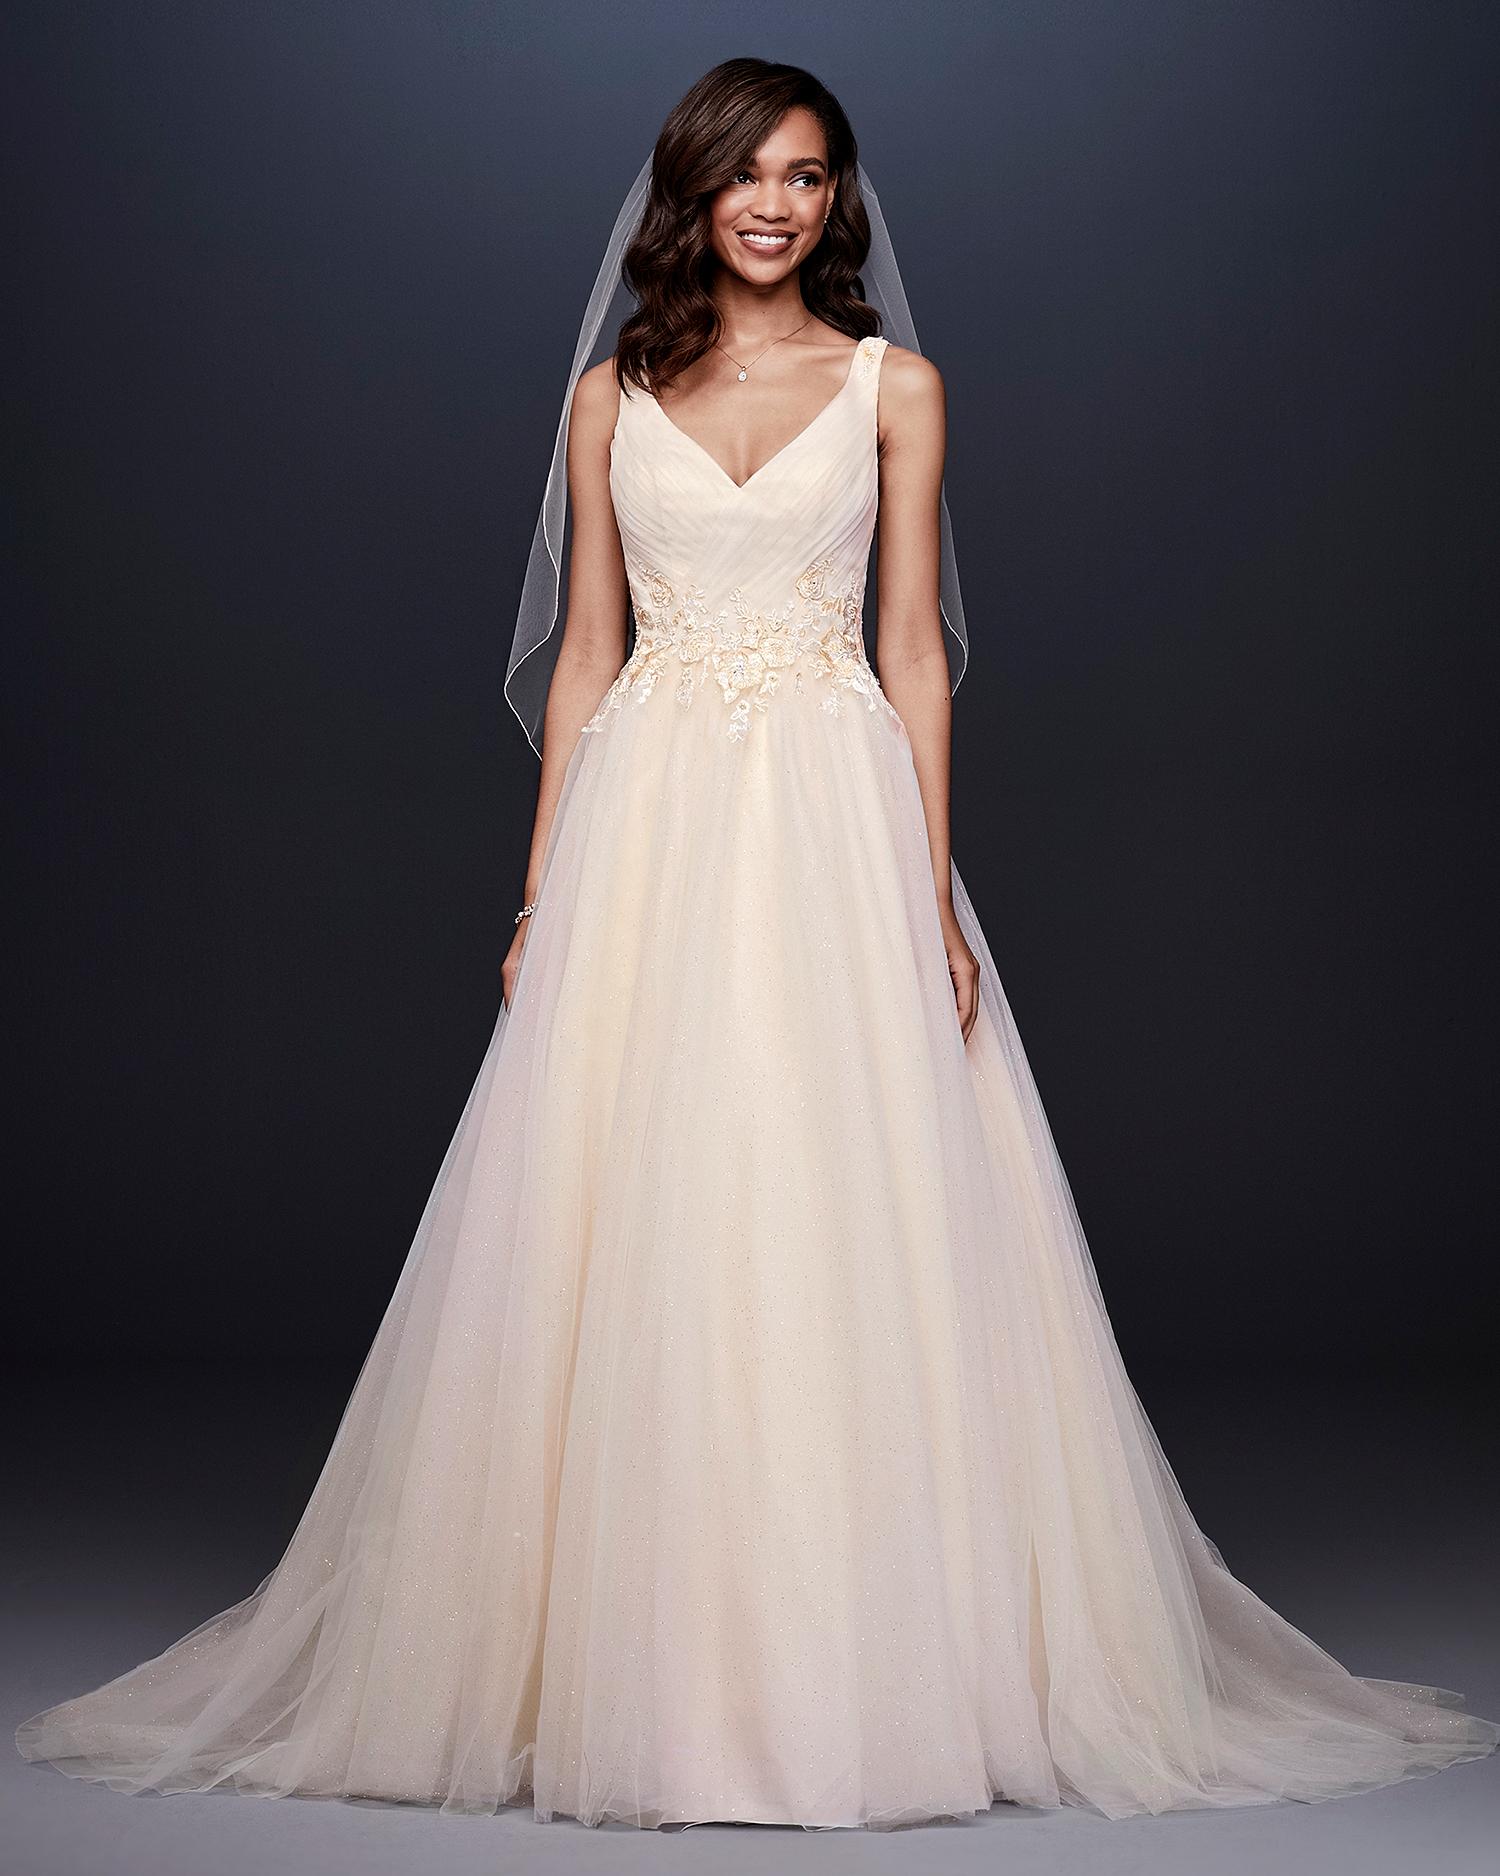 davids bridal wedding dress fall 2019 v-neck with floral appliques at waist